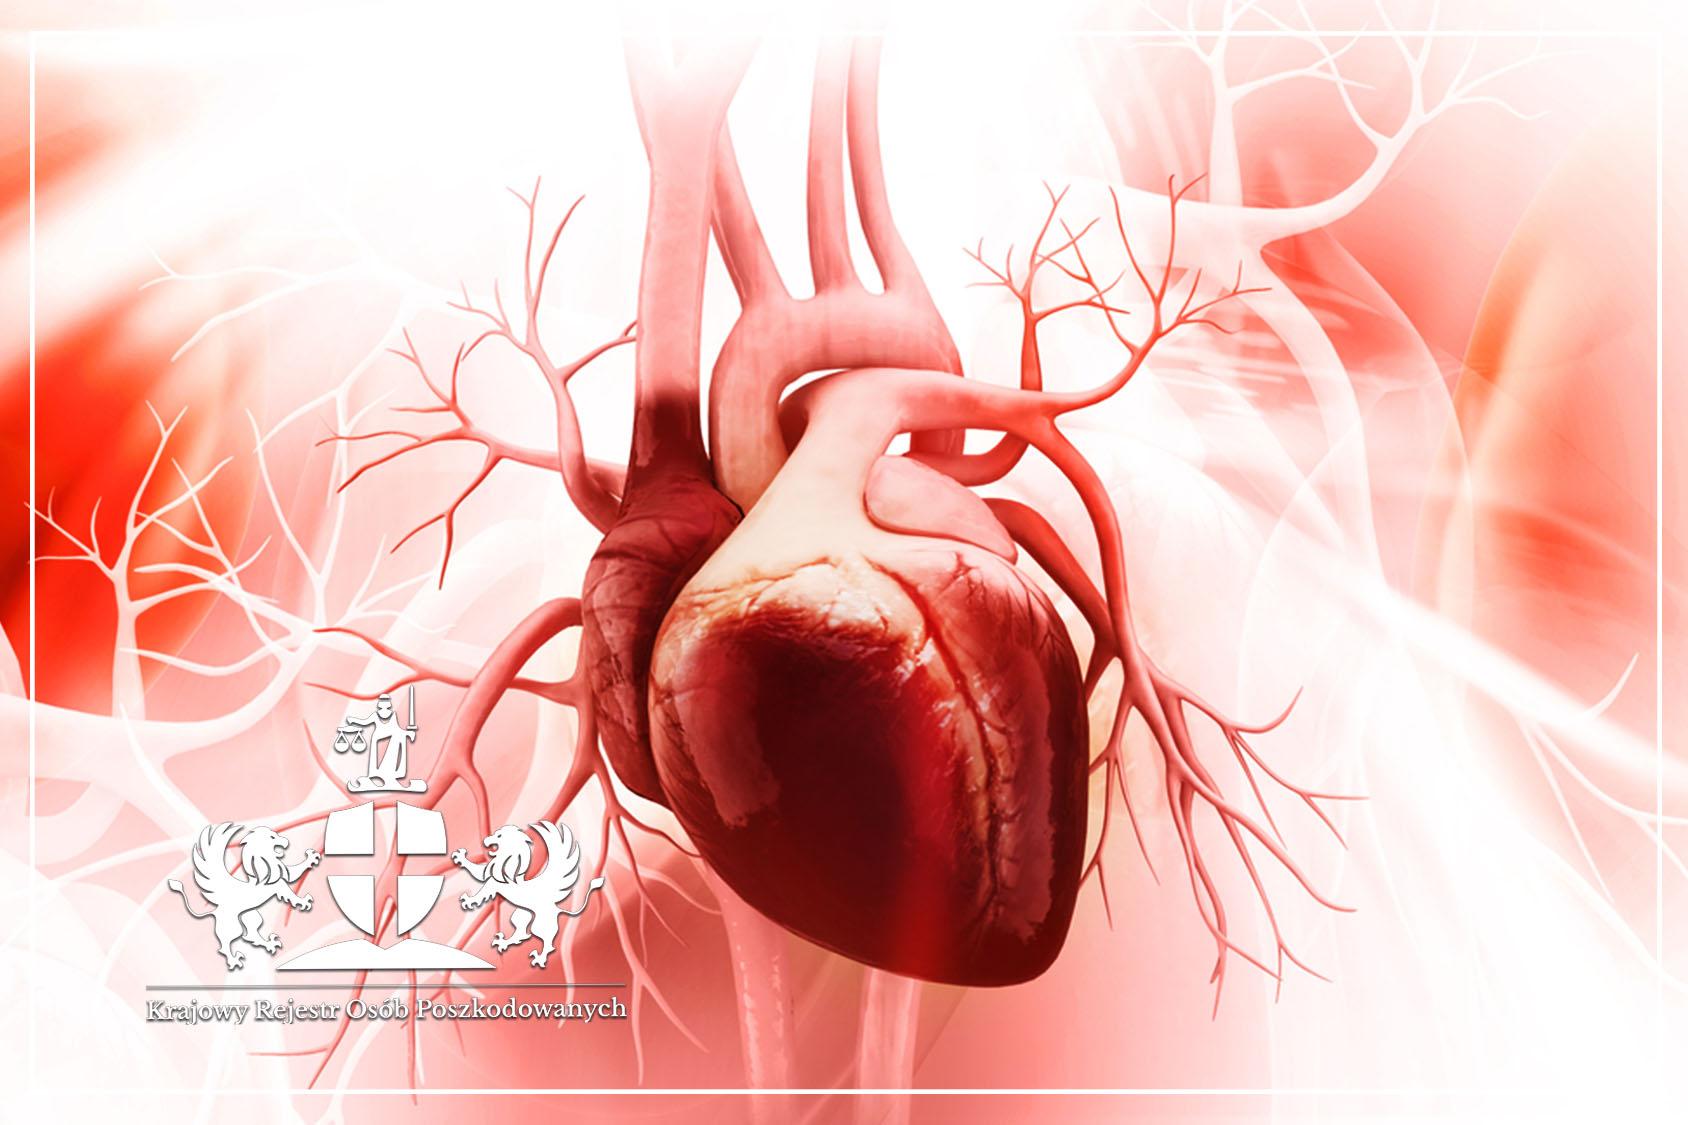 Patologie mięśnia sercowego